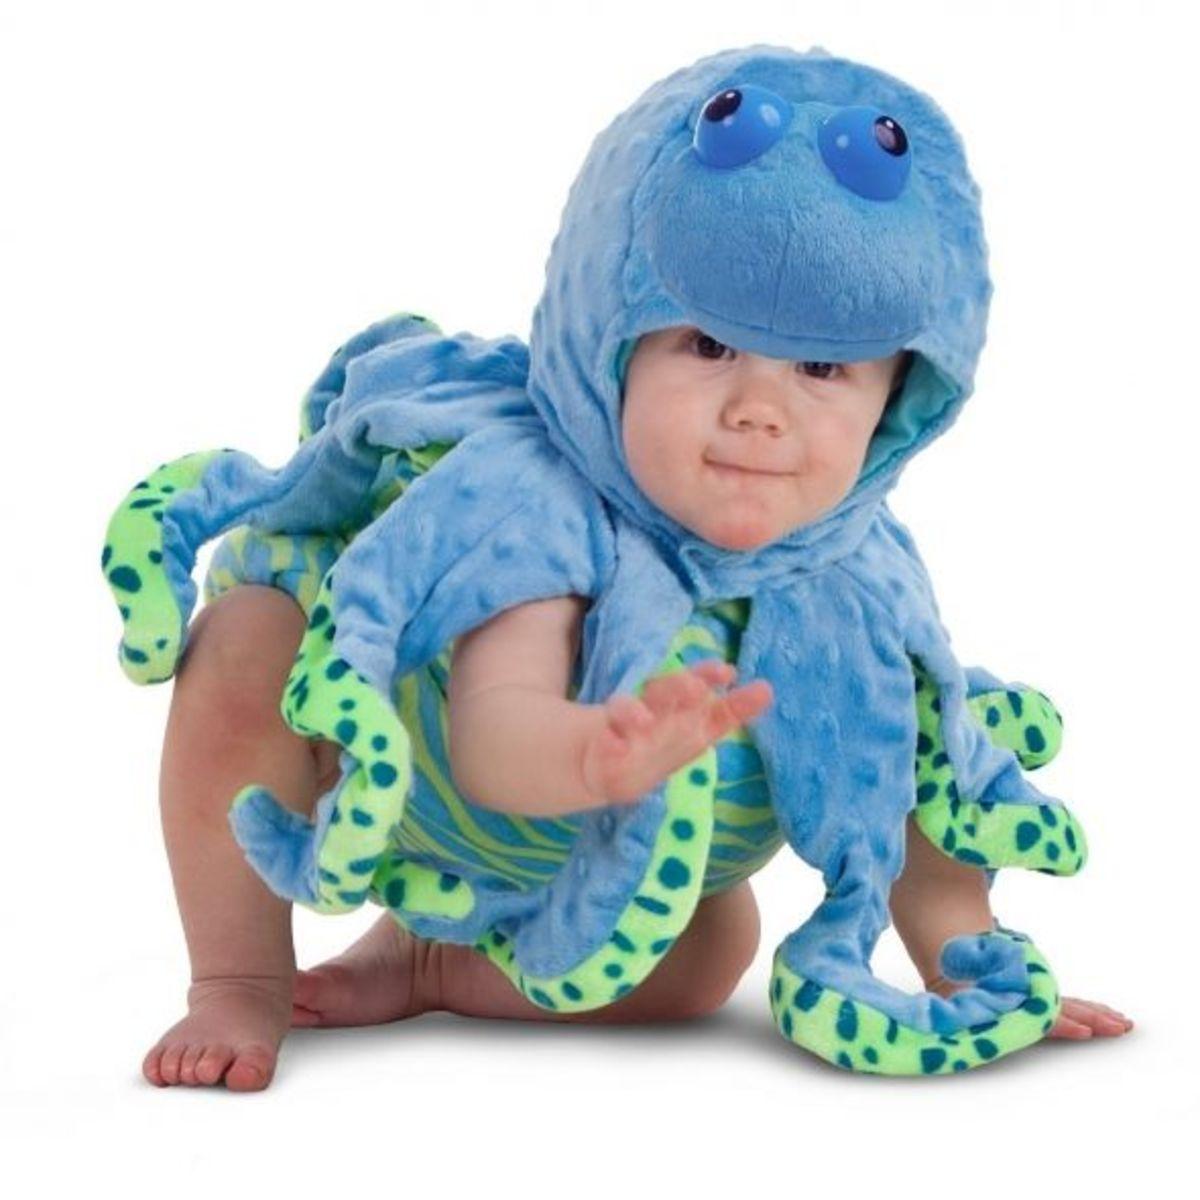 Ocean Octopus Infant / Toddler Costume